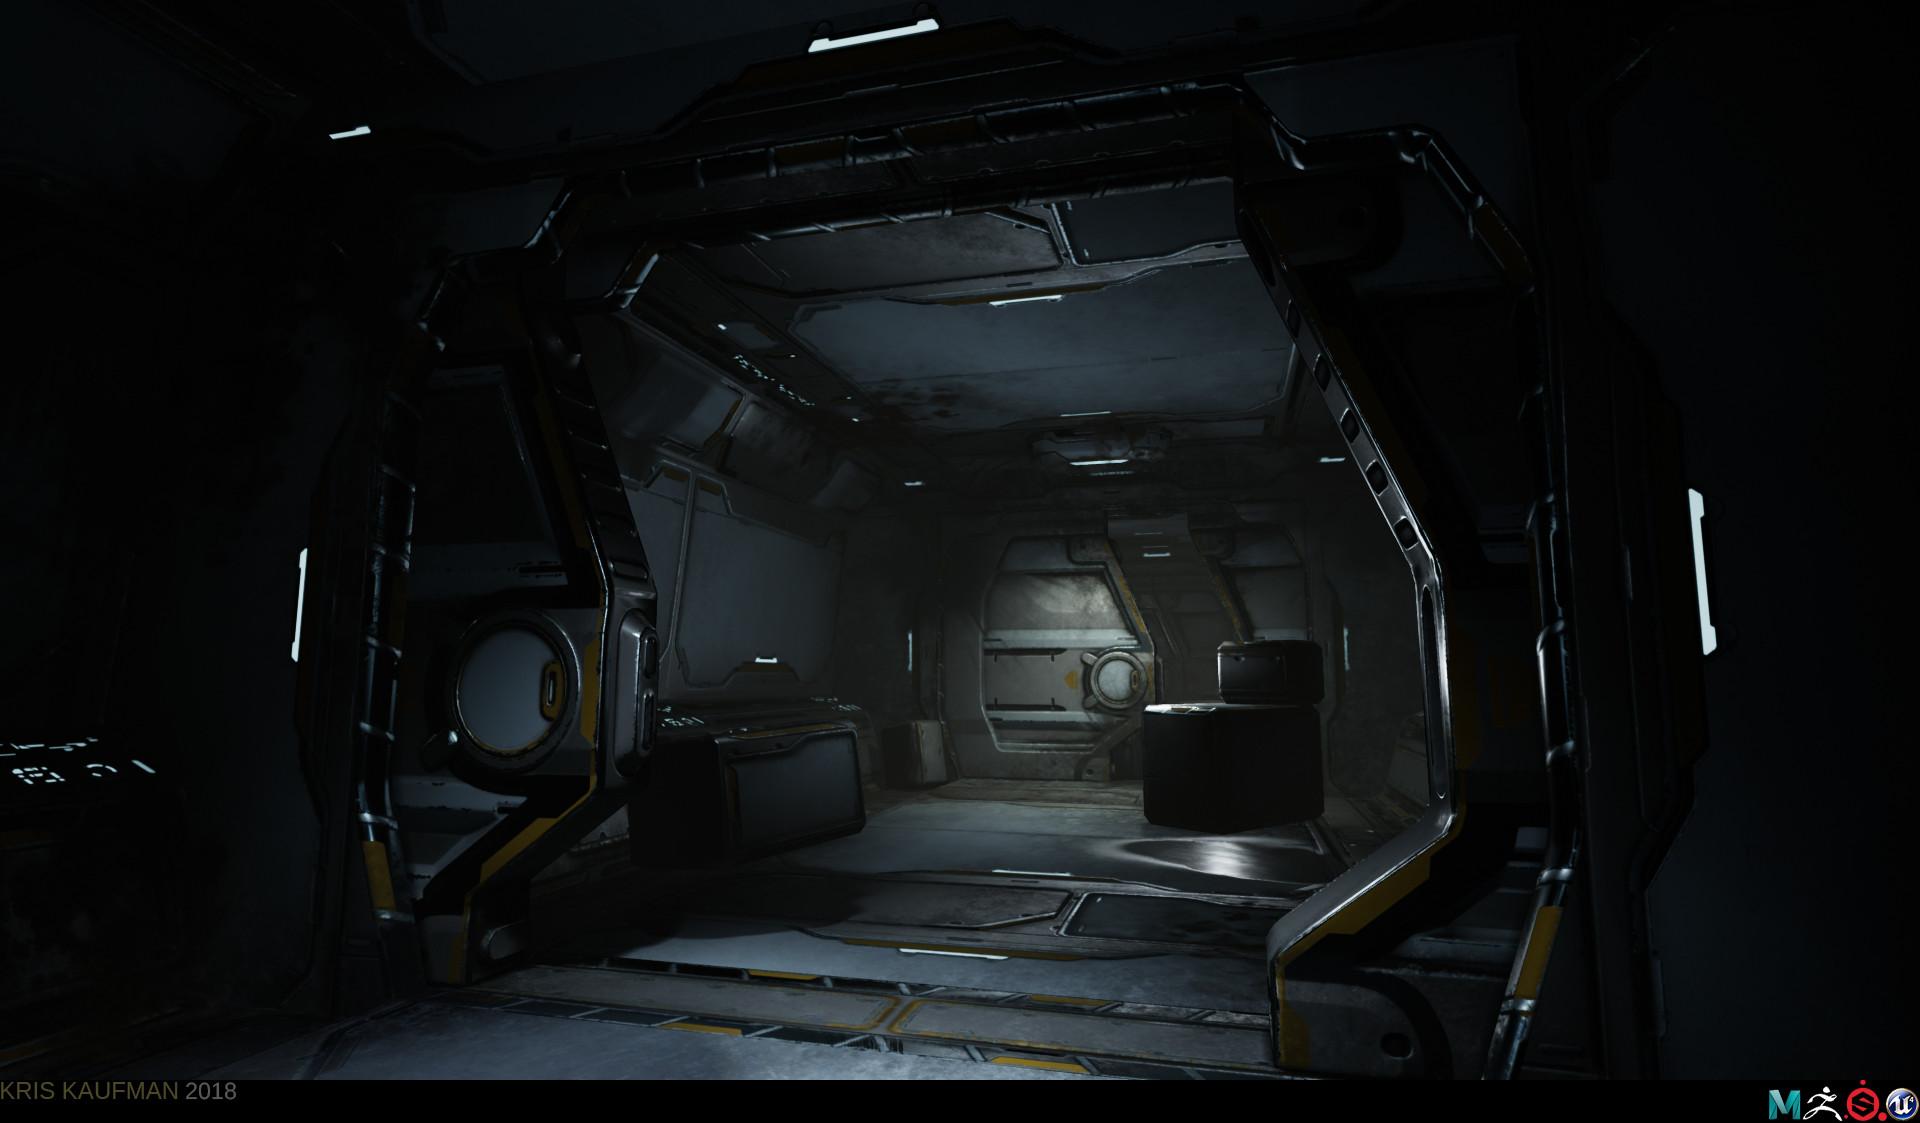 Kris kaufman corridor 02